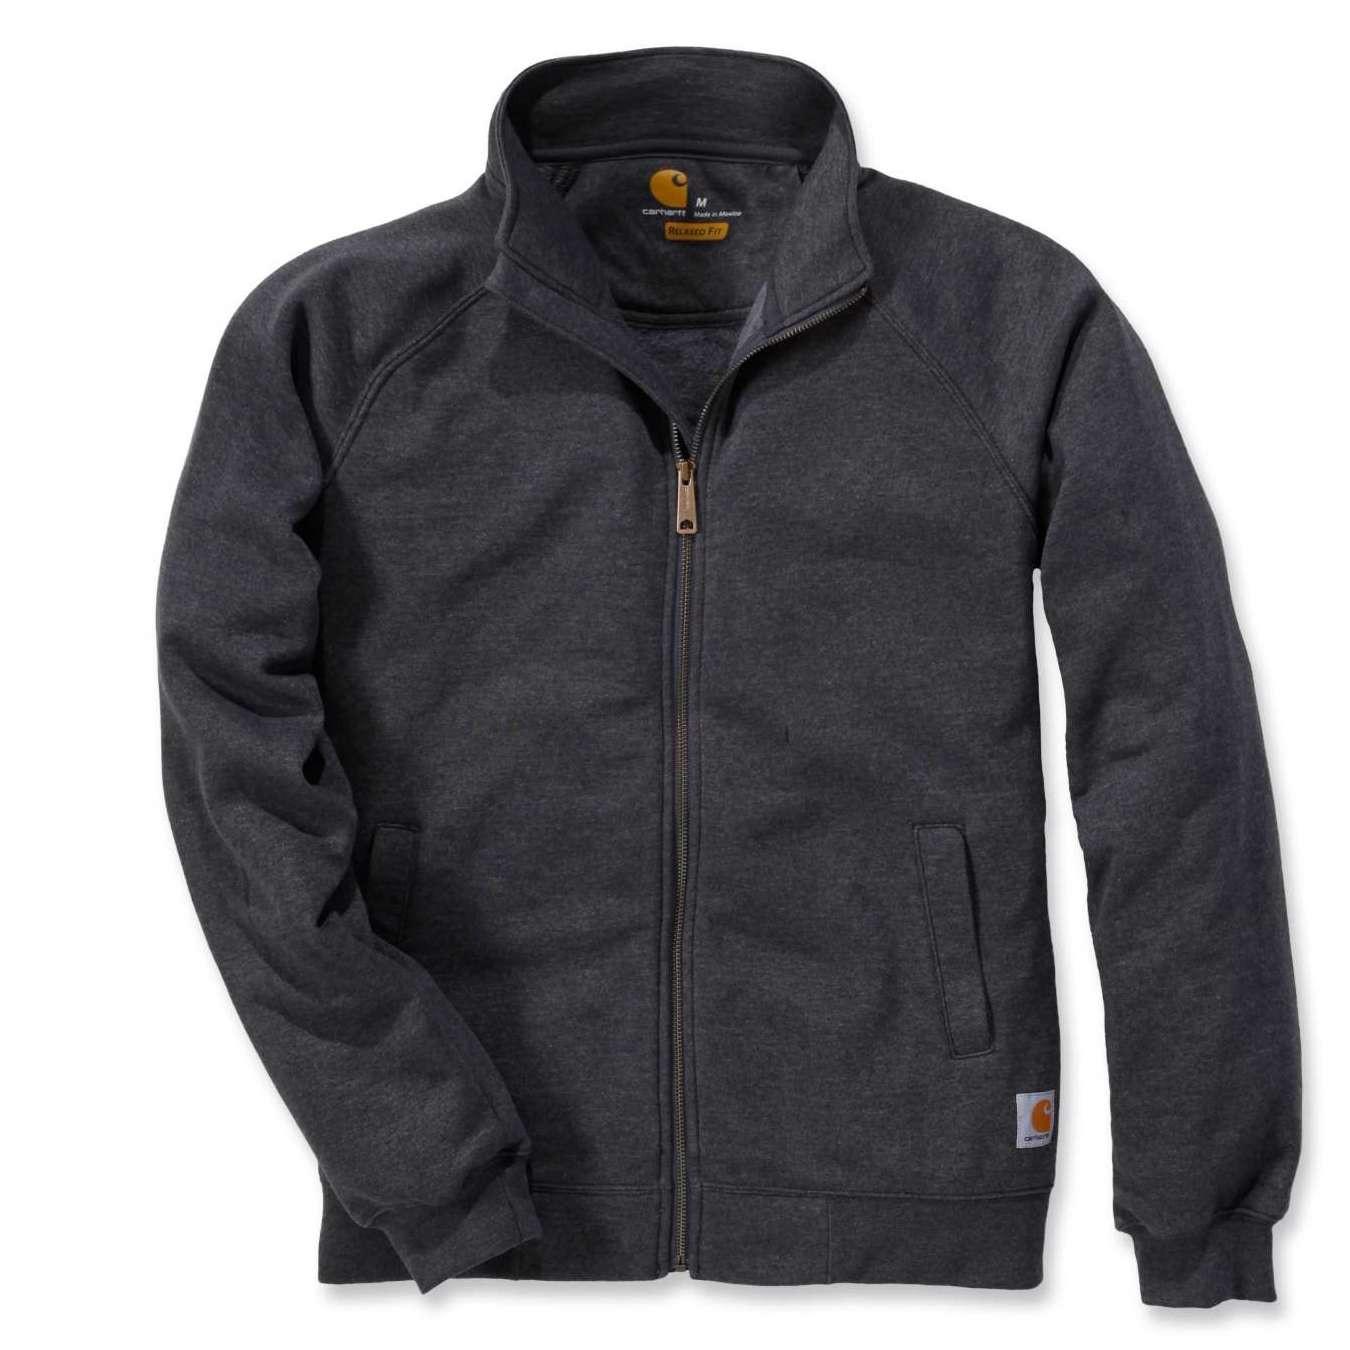 Свитшот на молнии Carhartt Midweight Mock Neck Zip Sweatshirt - K350 (Carbon Heather, XS)